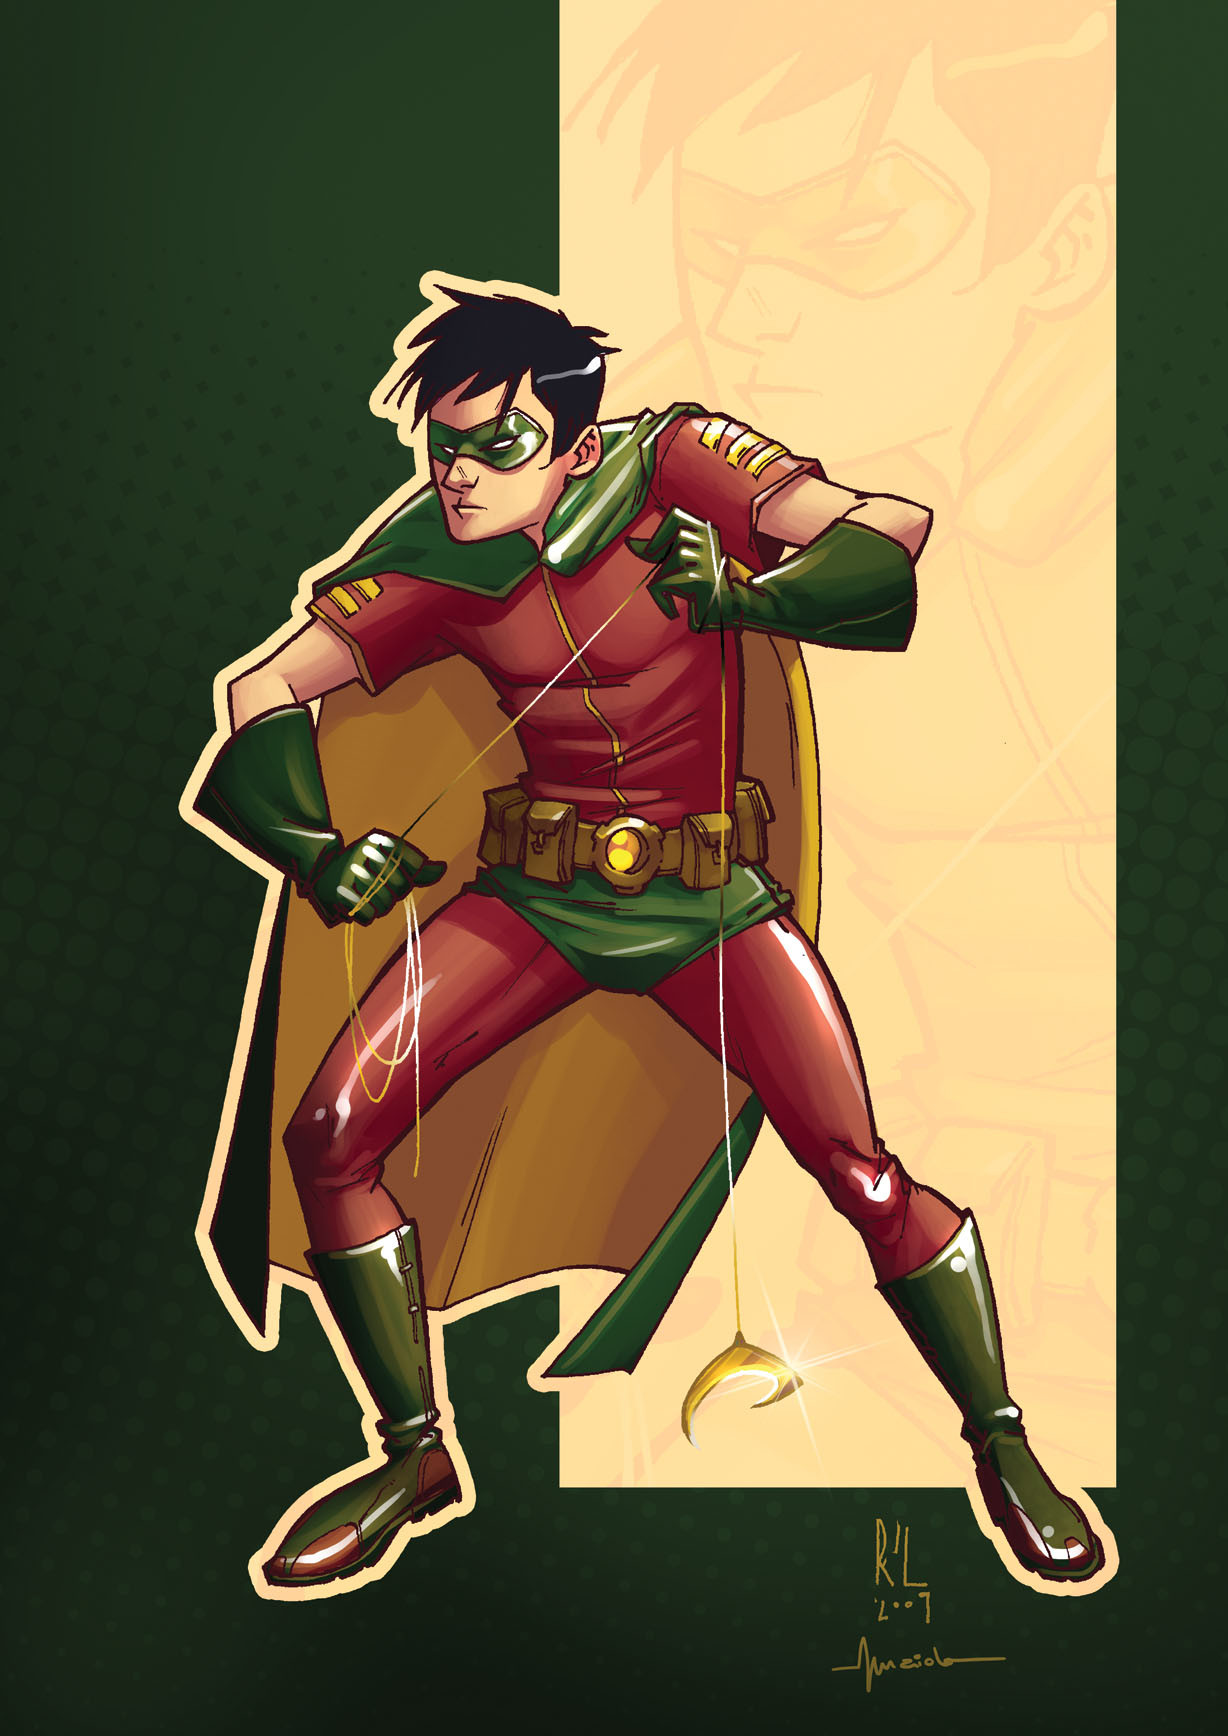 Robin by Maiolo